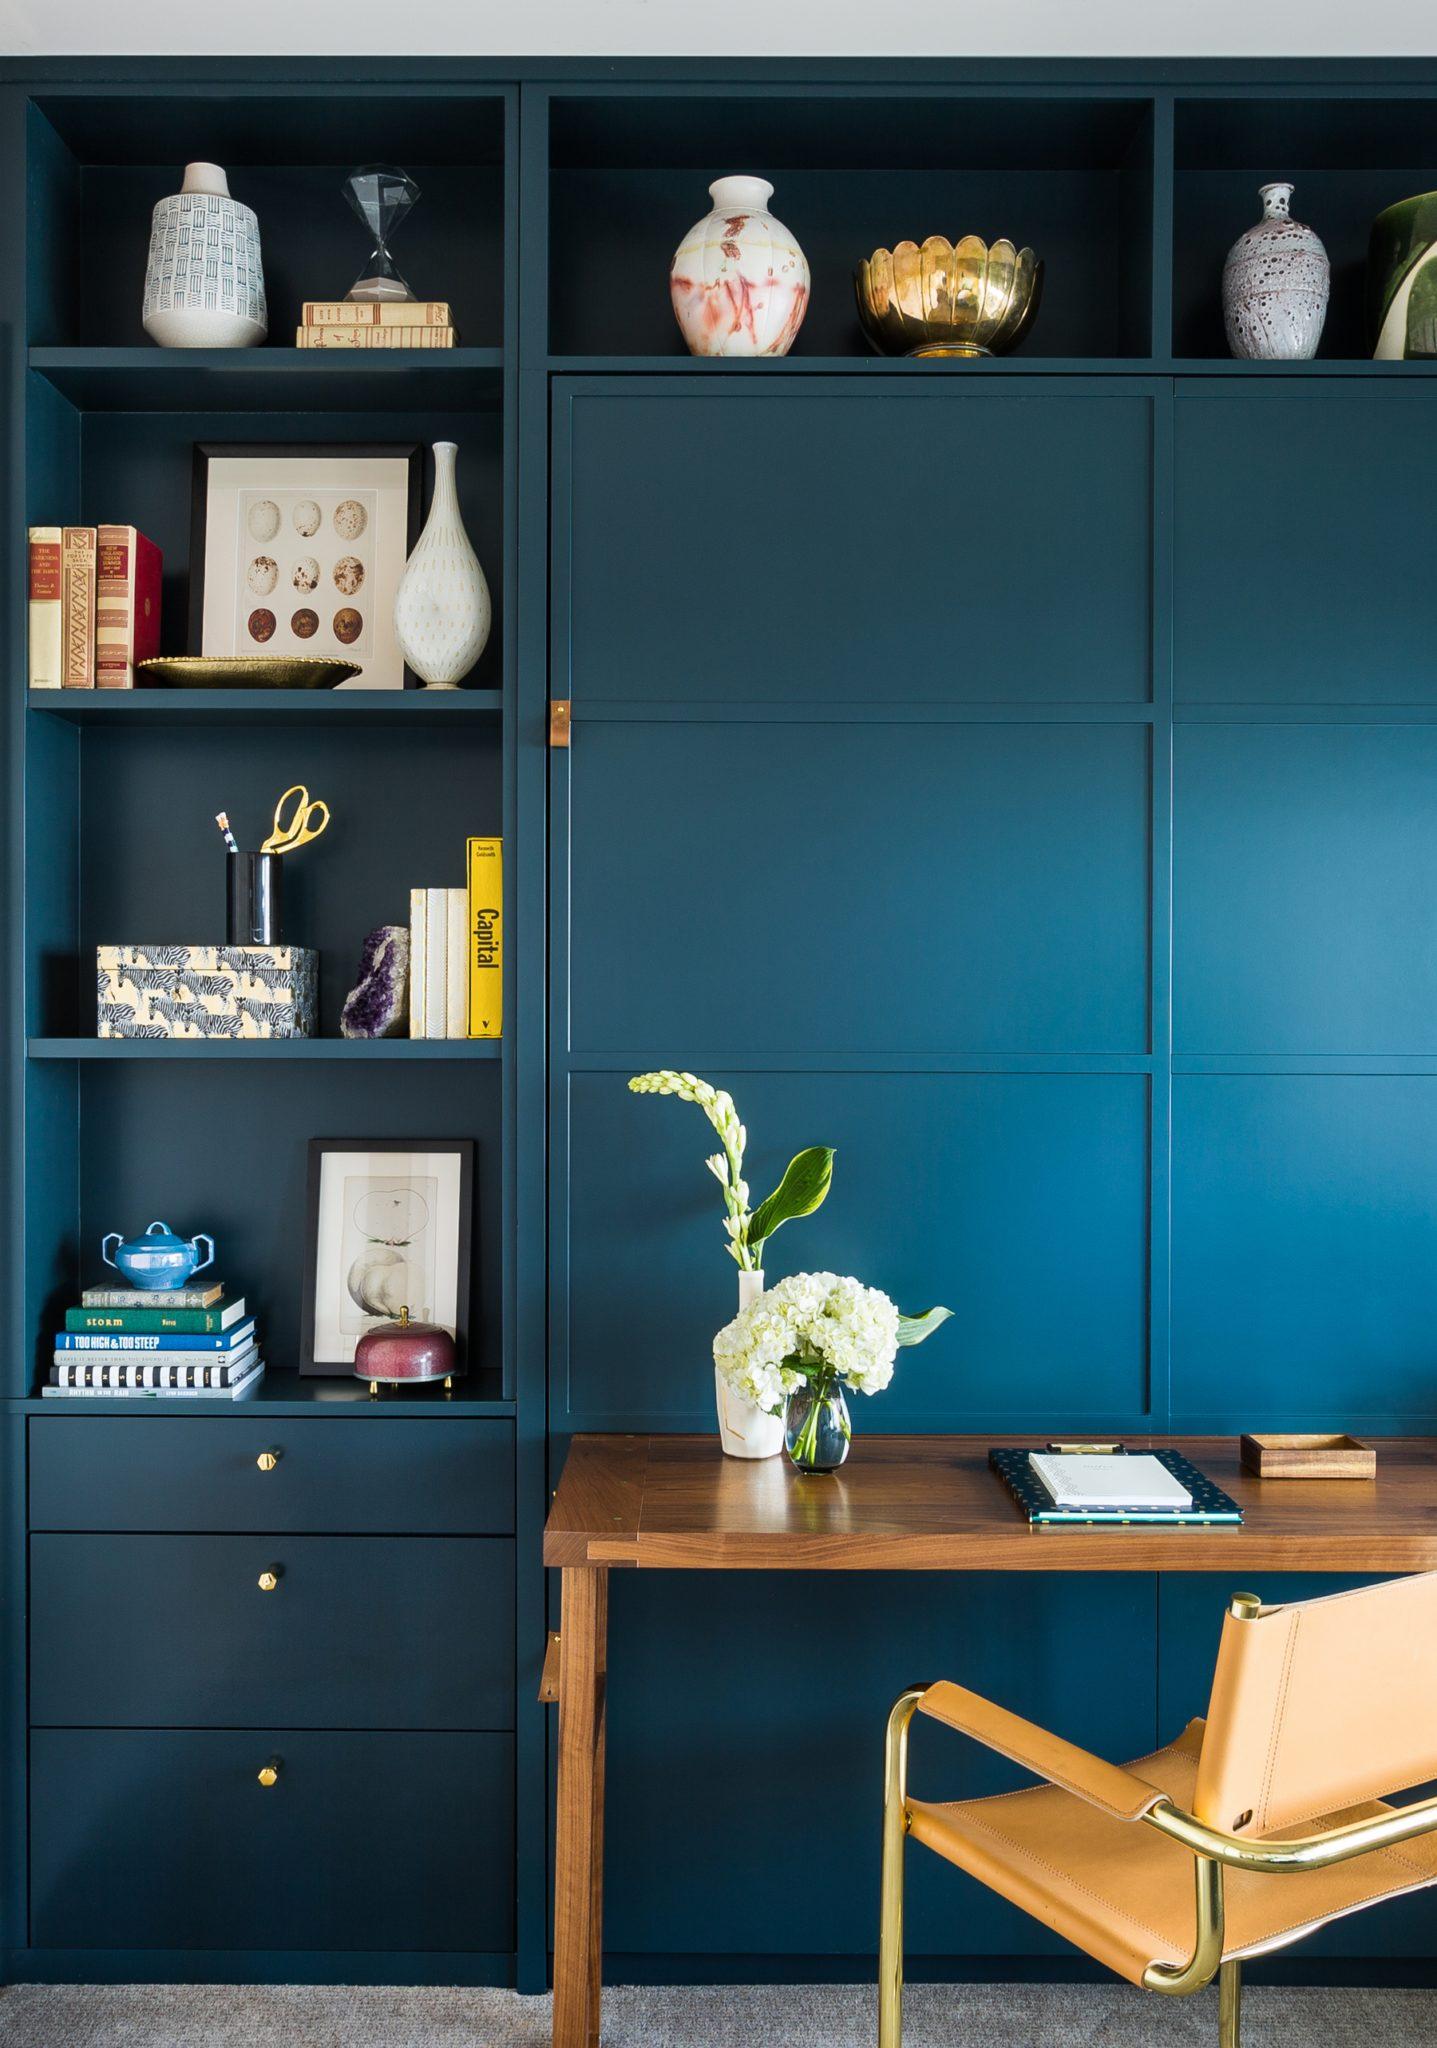 Interior design by Brio Interior Design